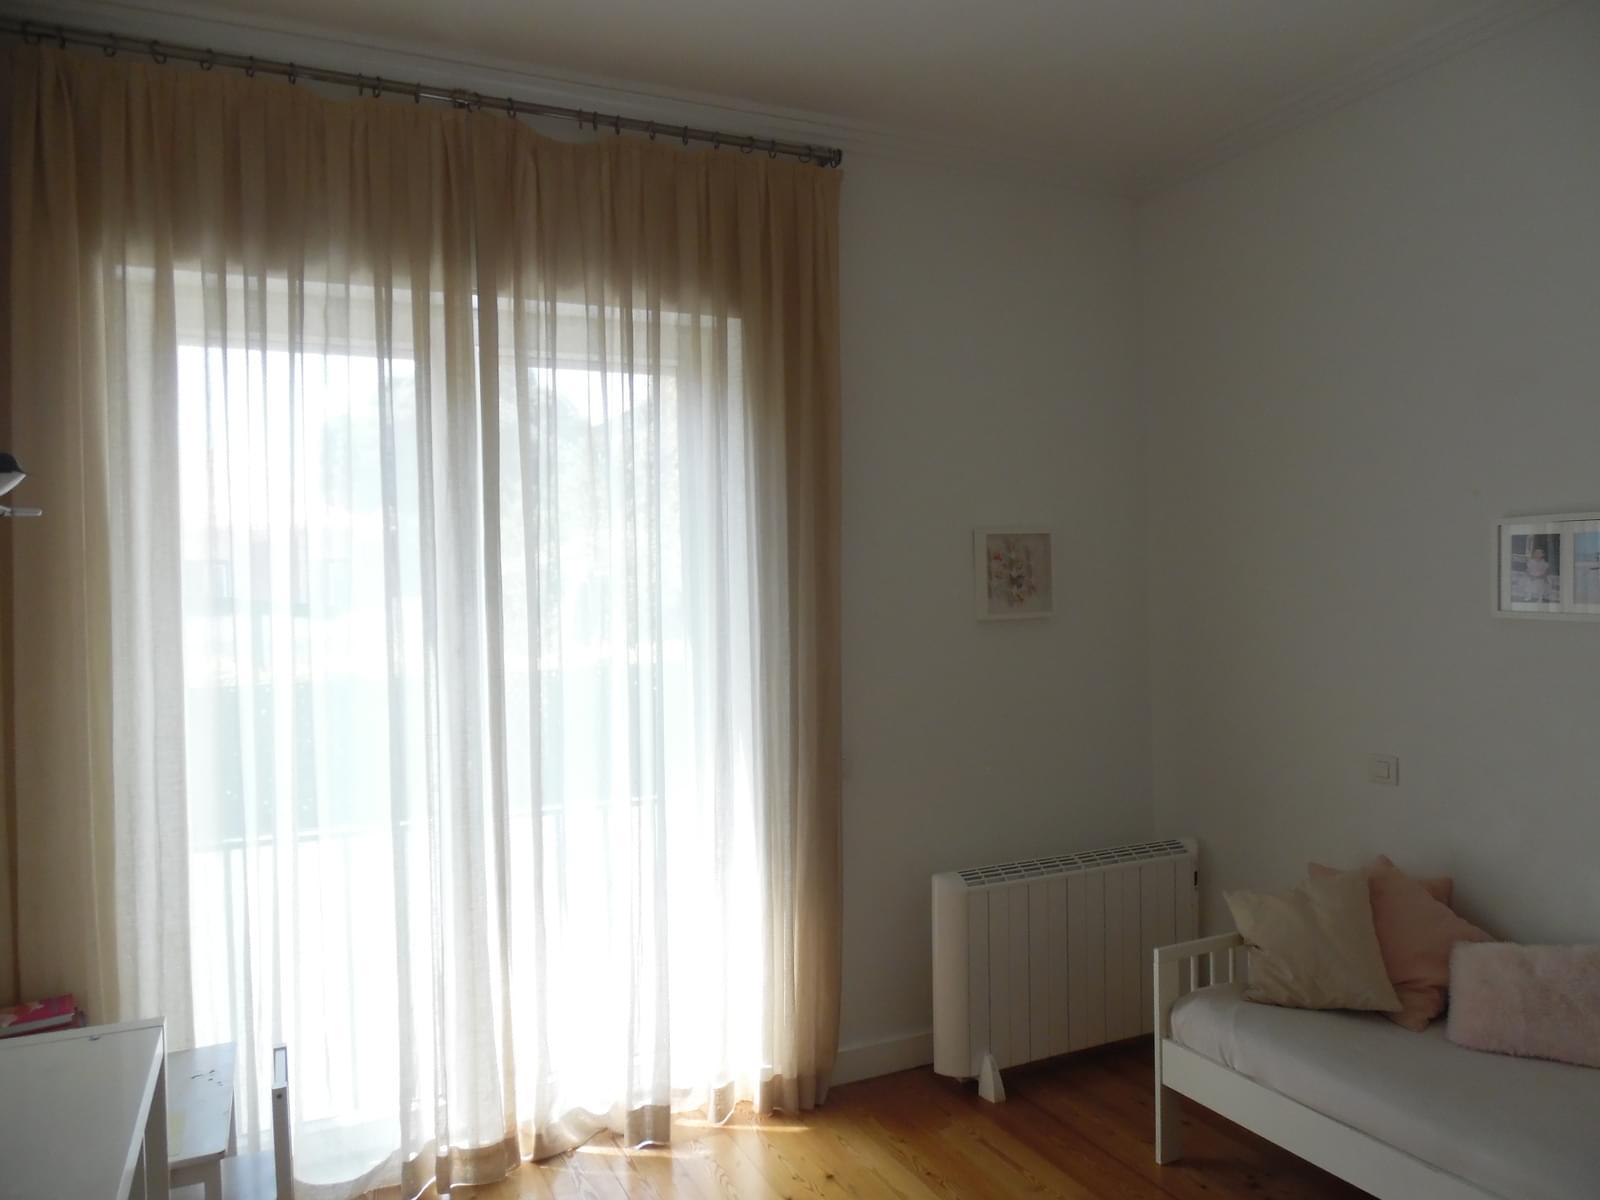 pf17454-apartamento-t4-lisboa-79755e30-f183-4858-8a8f-37ee19a19704